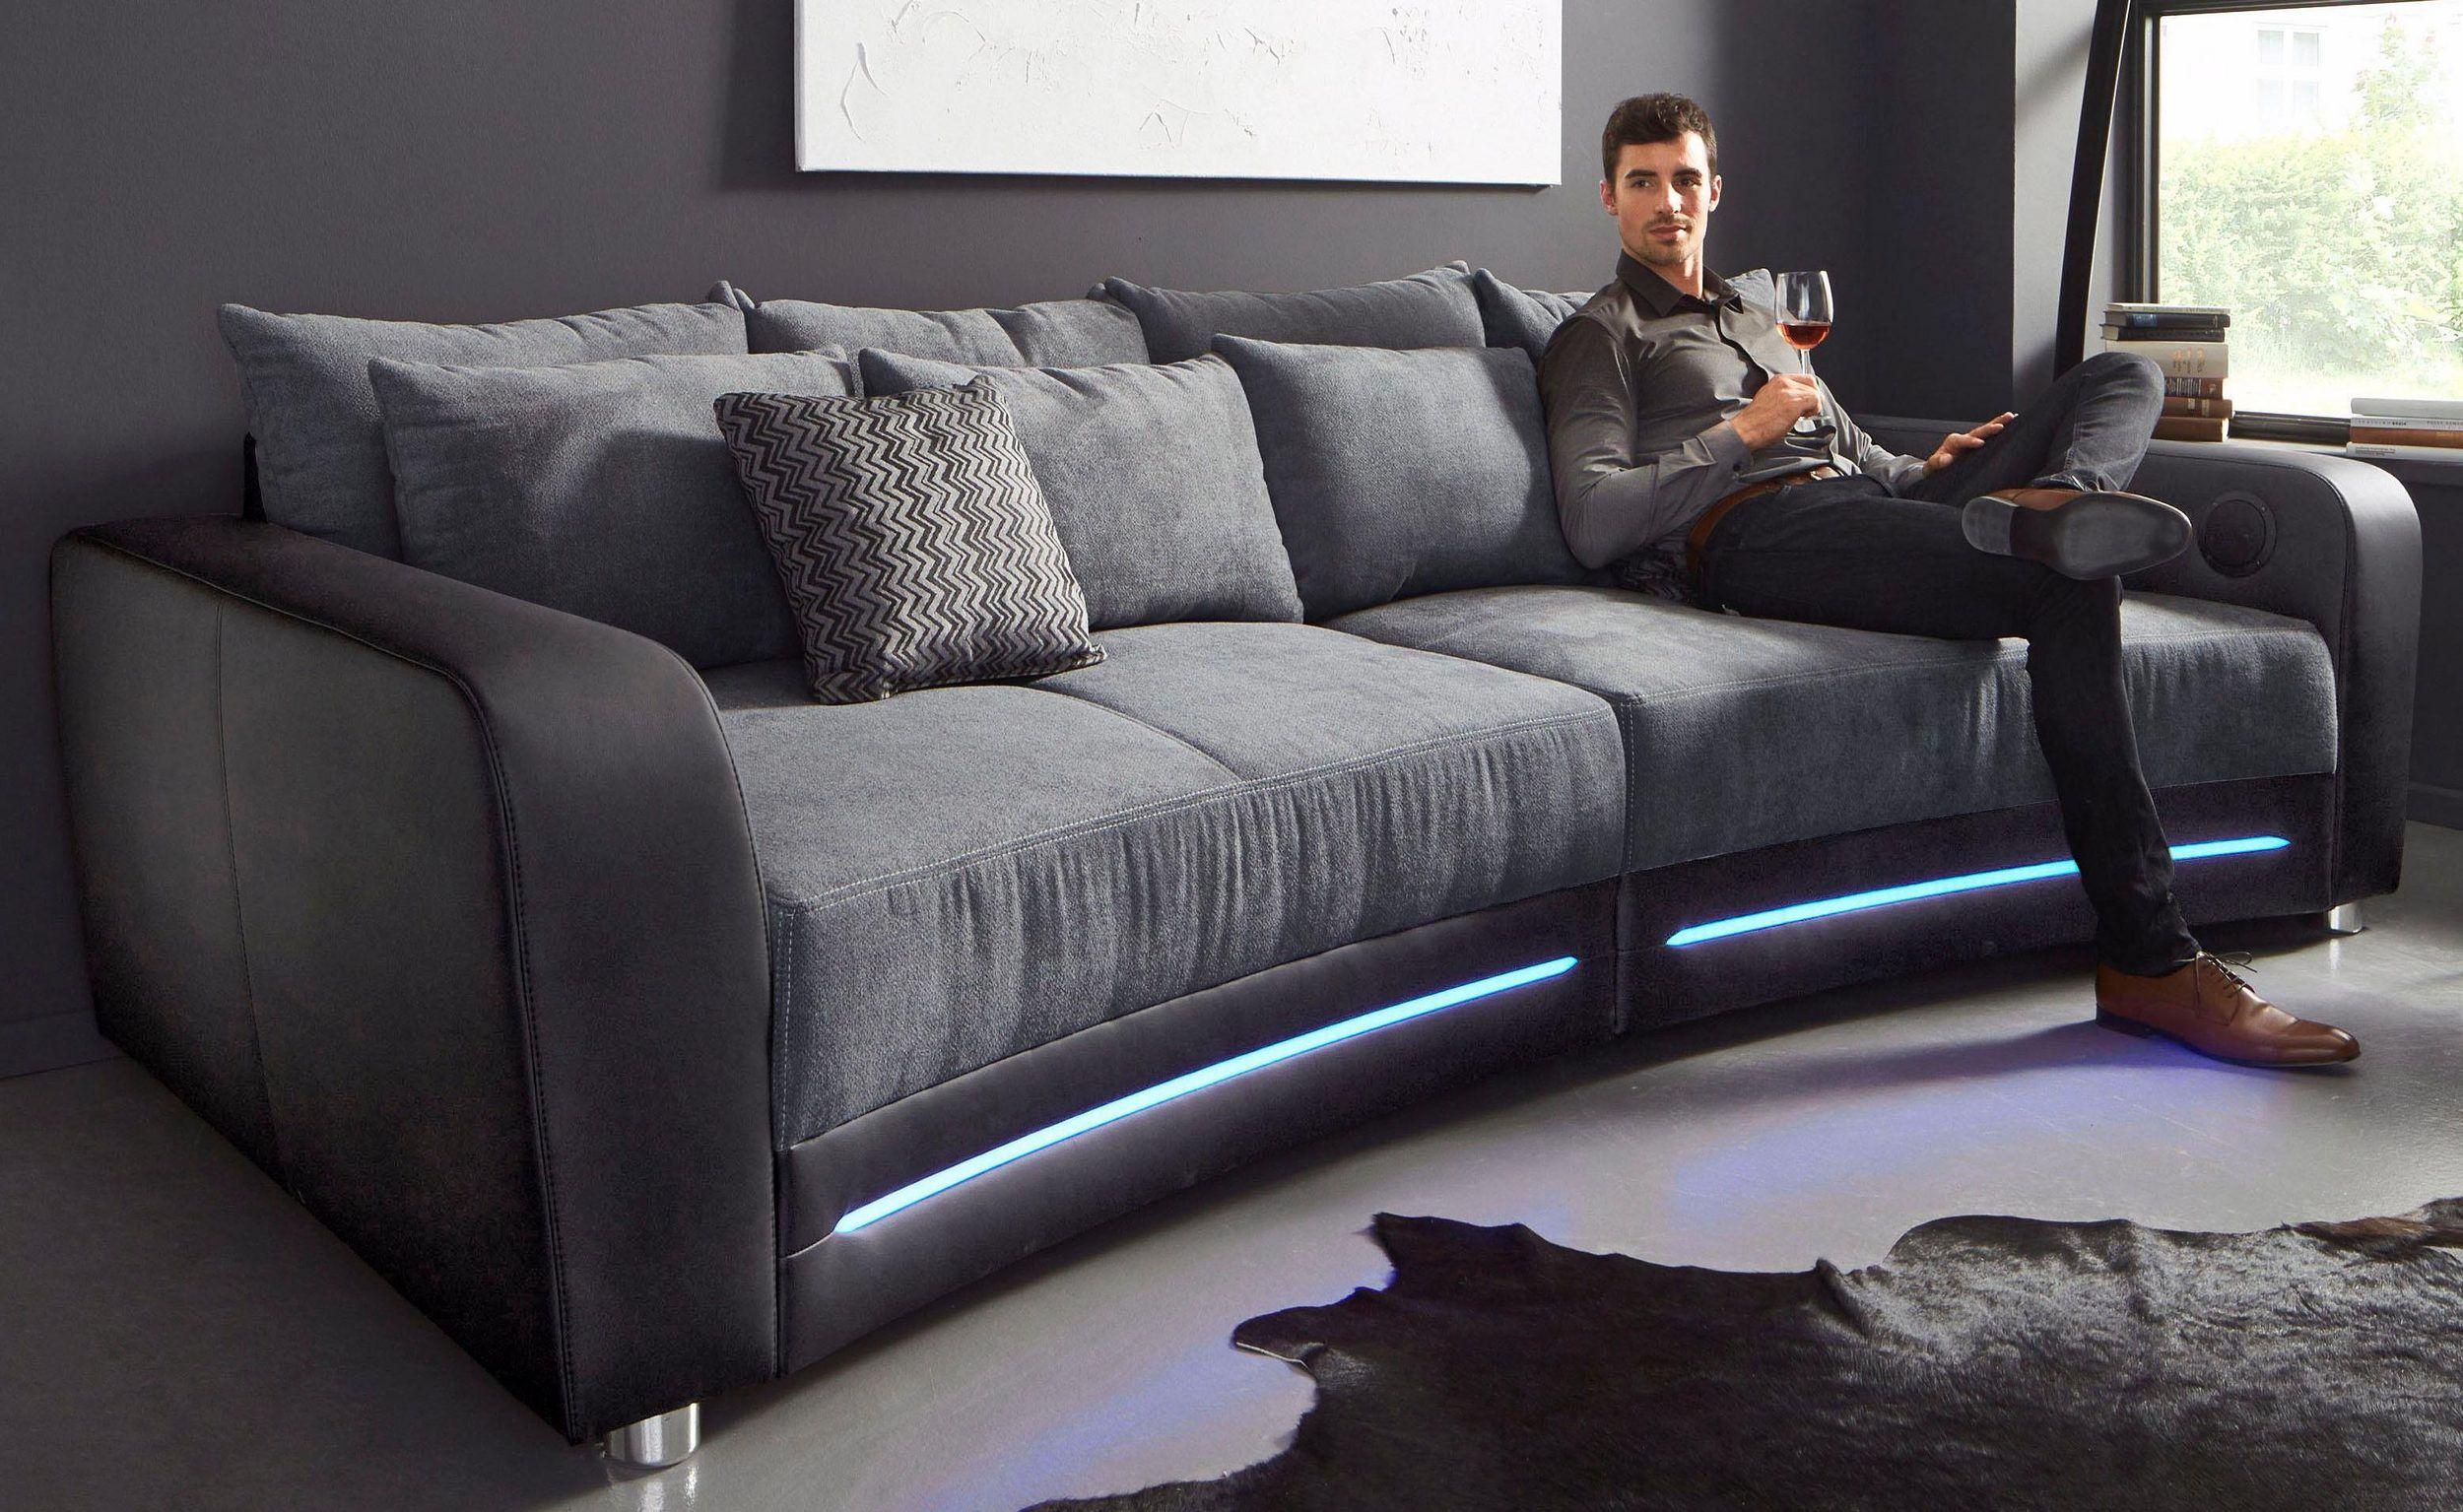 Jetzt 50 Reduziert Big Sofa Inklusive Rgb Led Beleuchtung Big Sofas Sofa Modern Couch